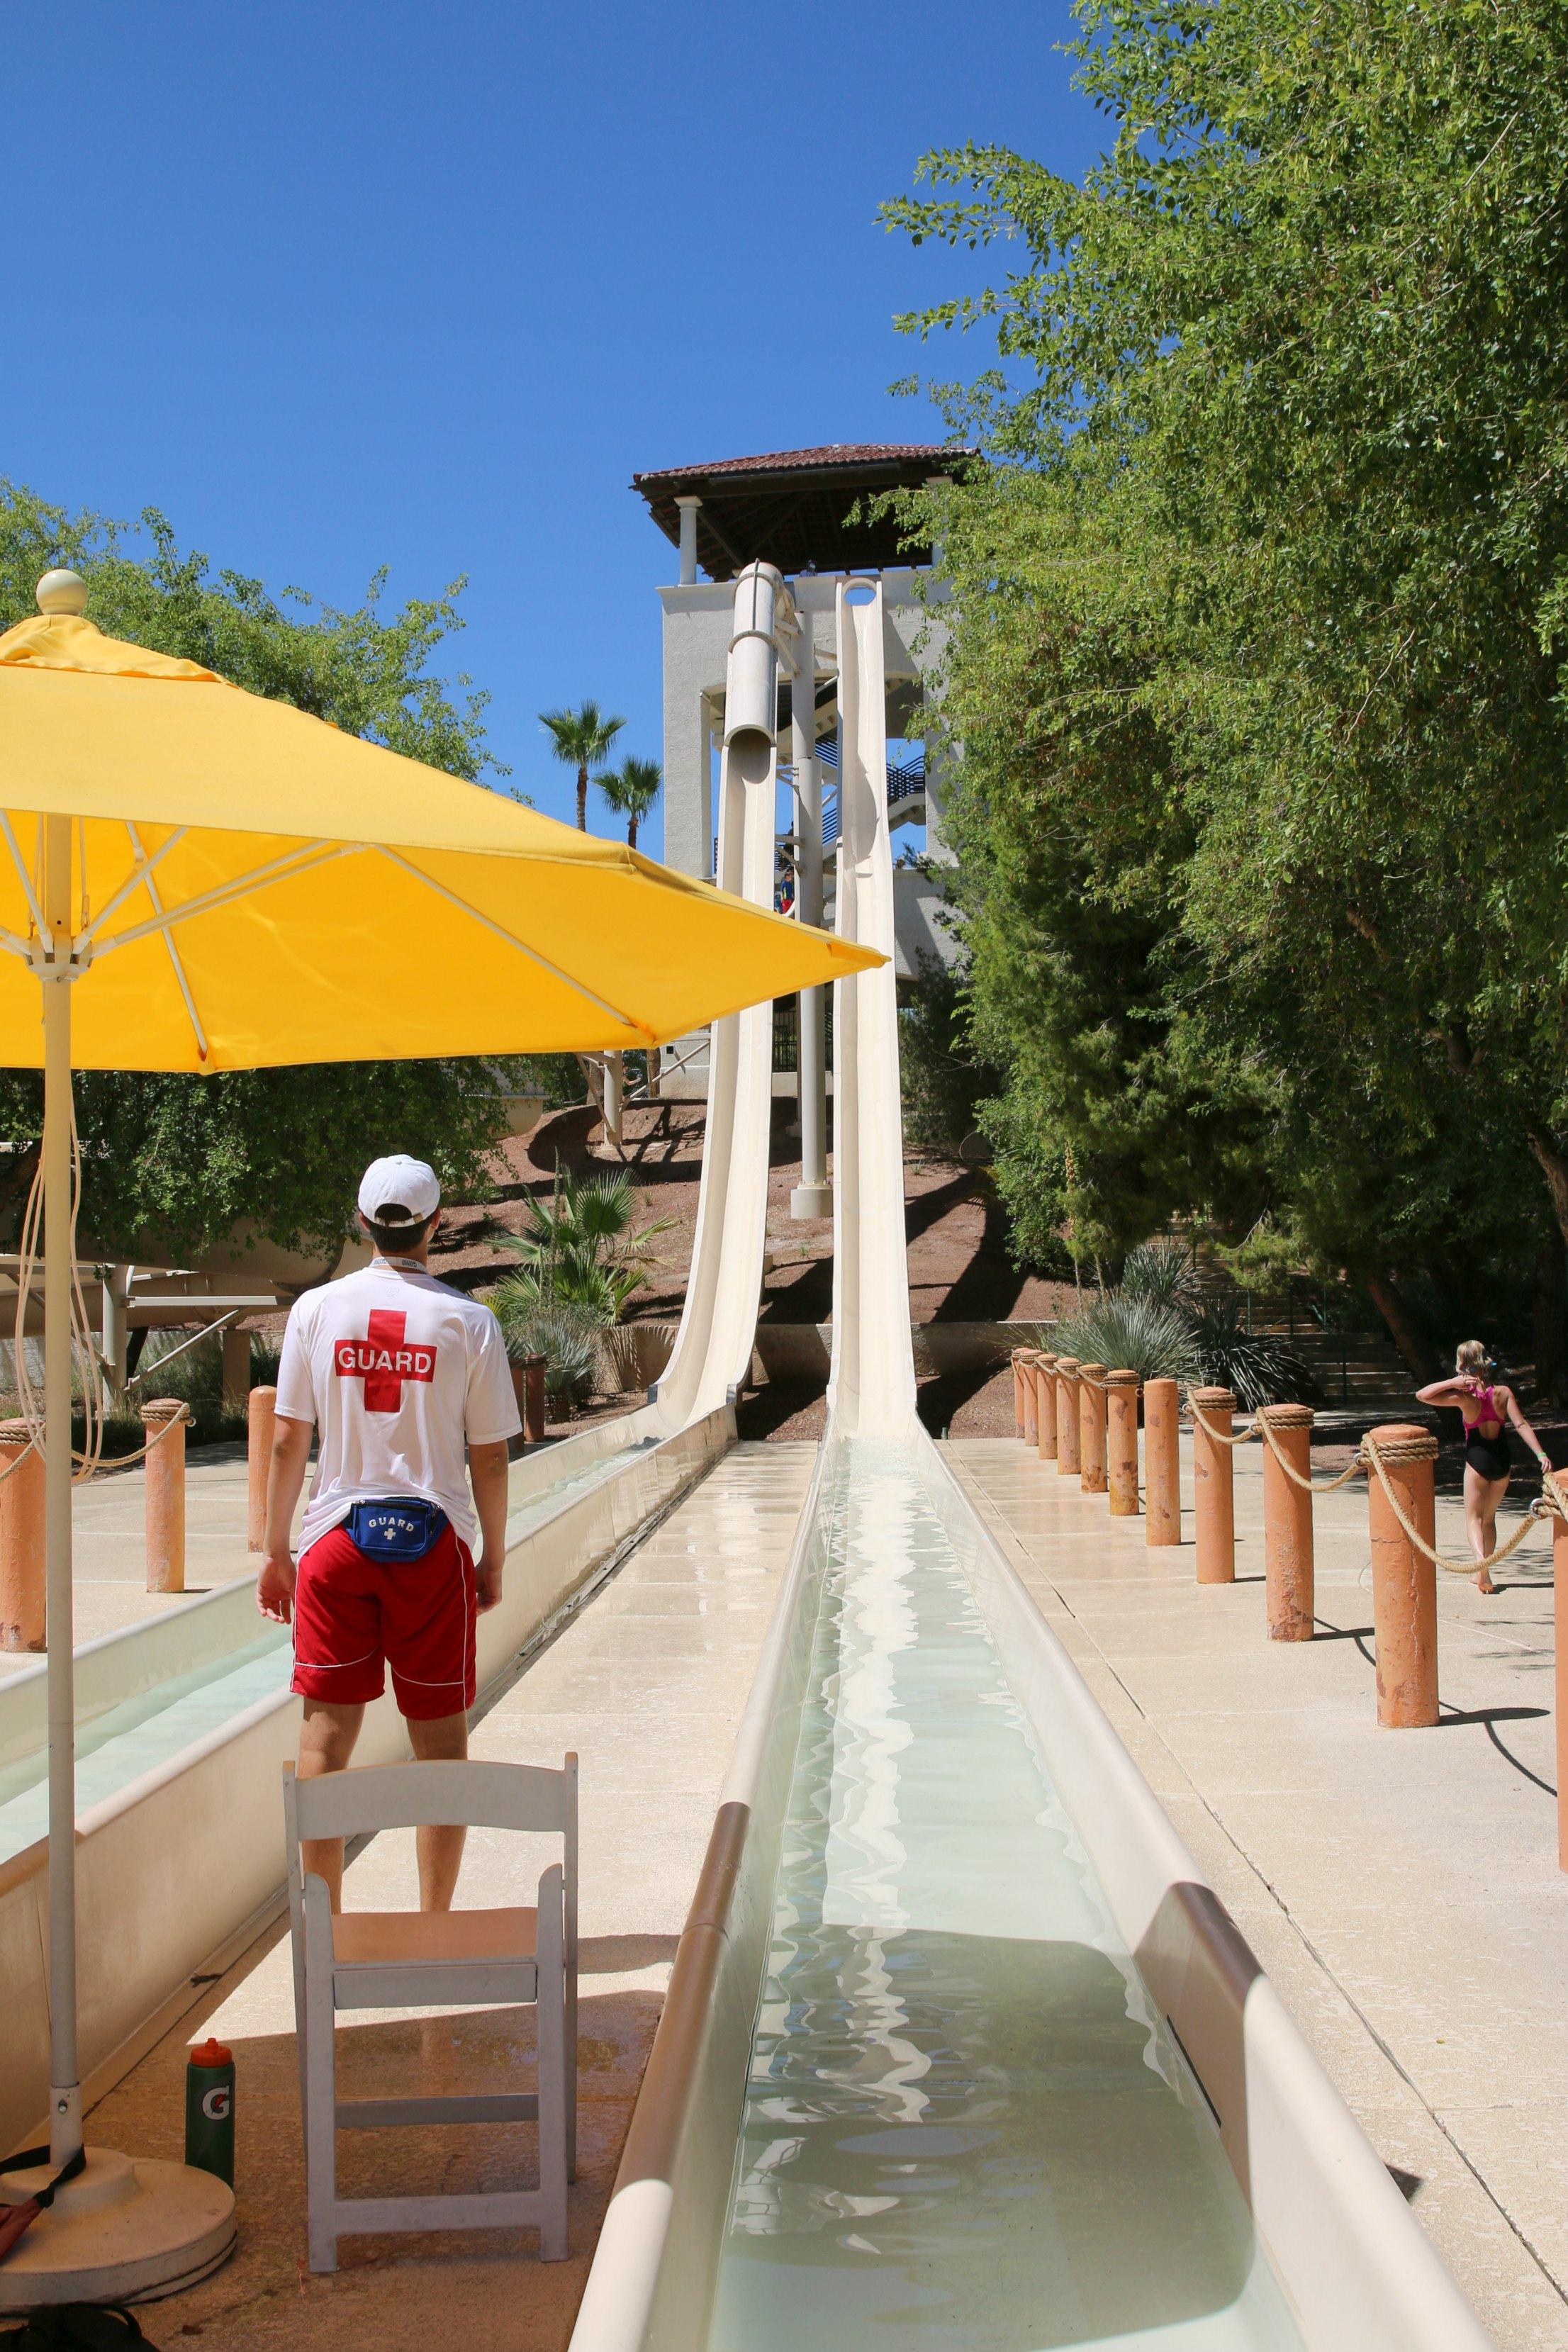 fun for kids at Arizona grand resort